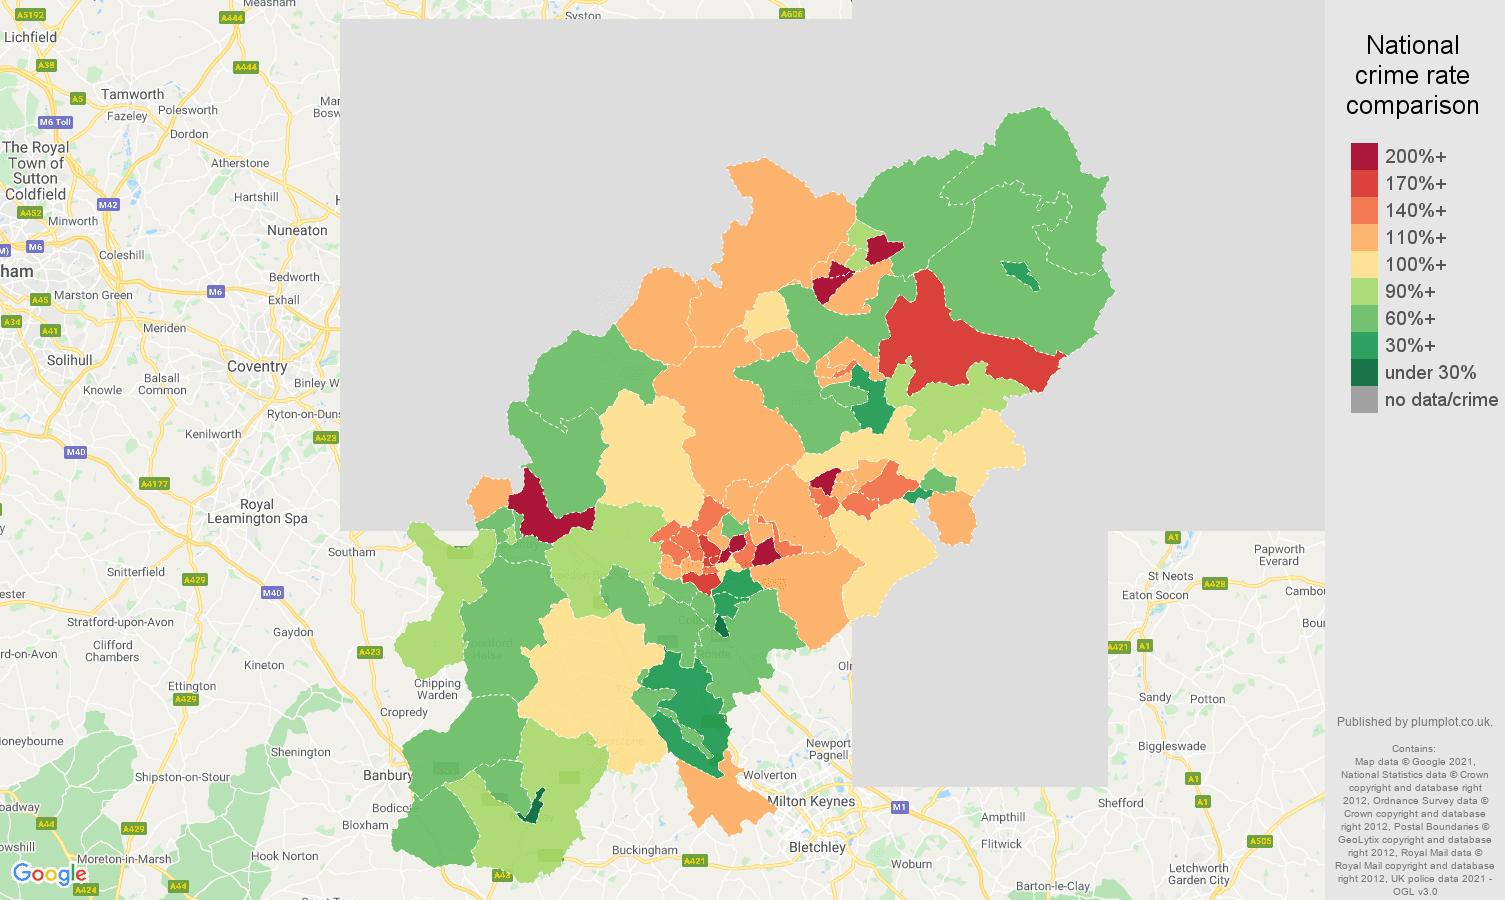 Northamptonshire burglary crime rate comparison map